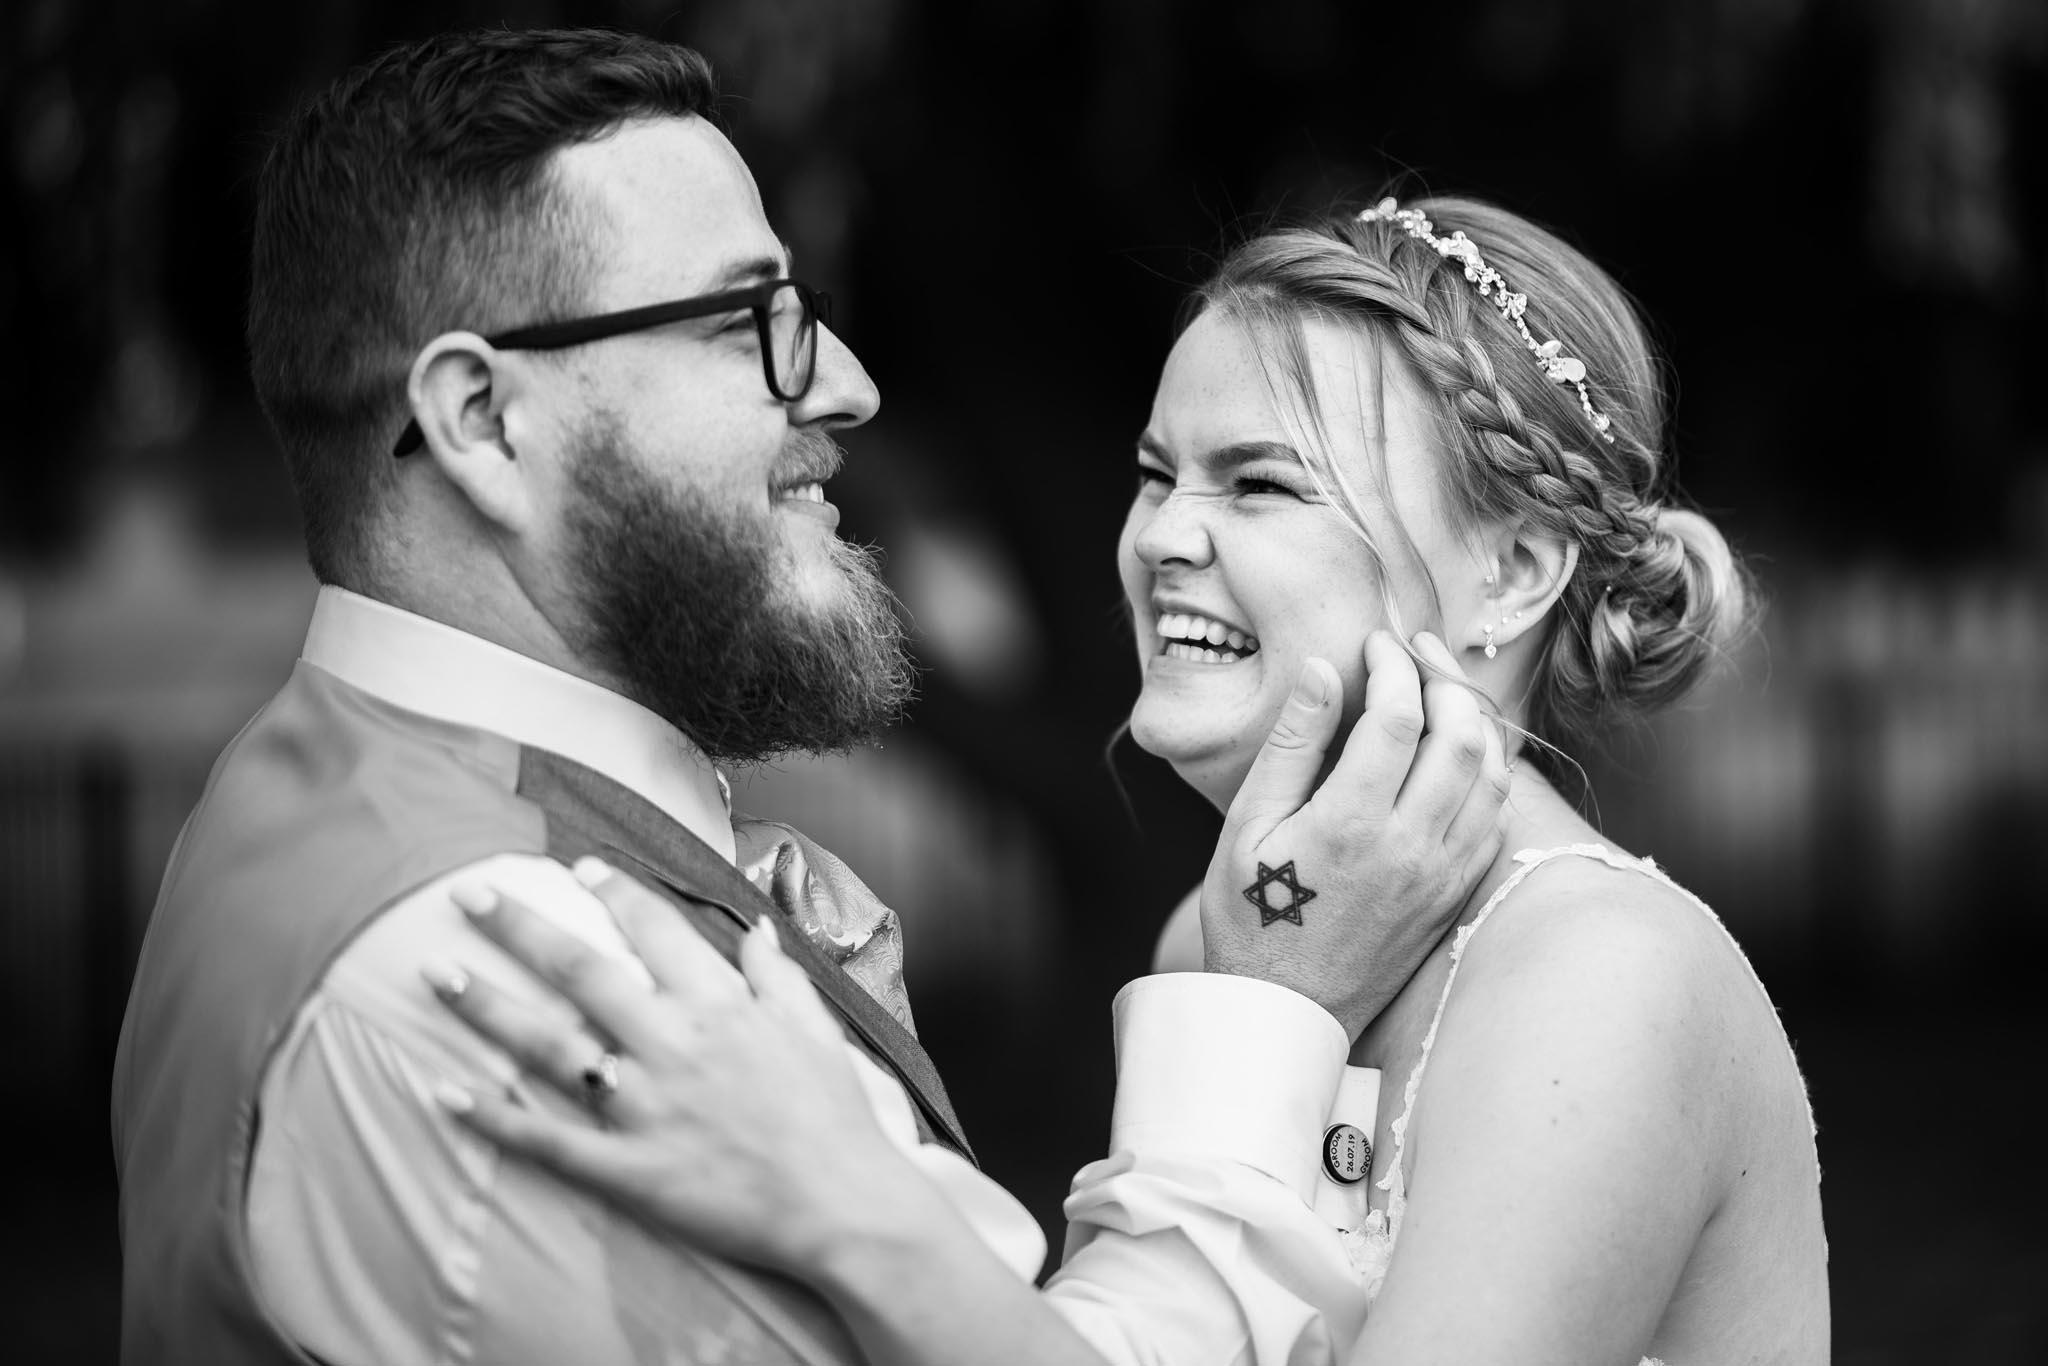 580-Bride-groom-Luke-Yasmin-The-Rayleigh-Club-Wedding-Photography.jpg